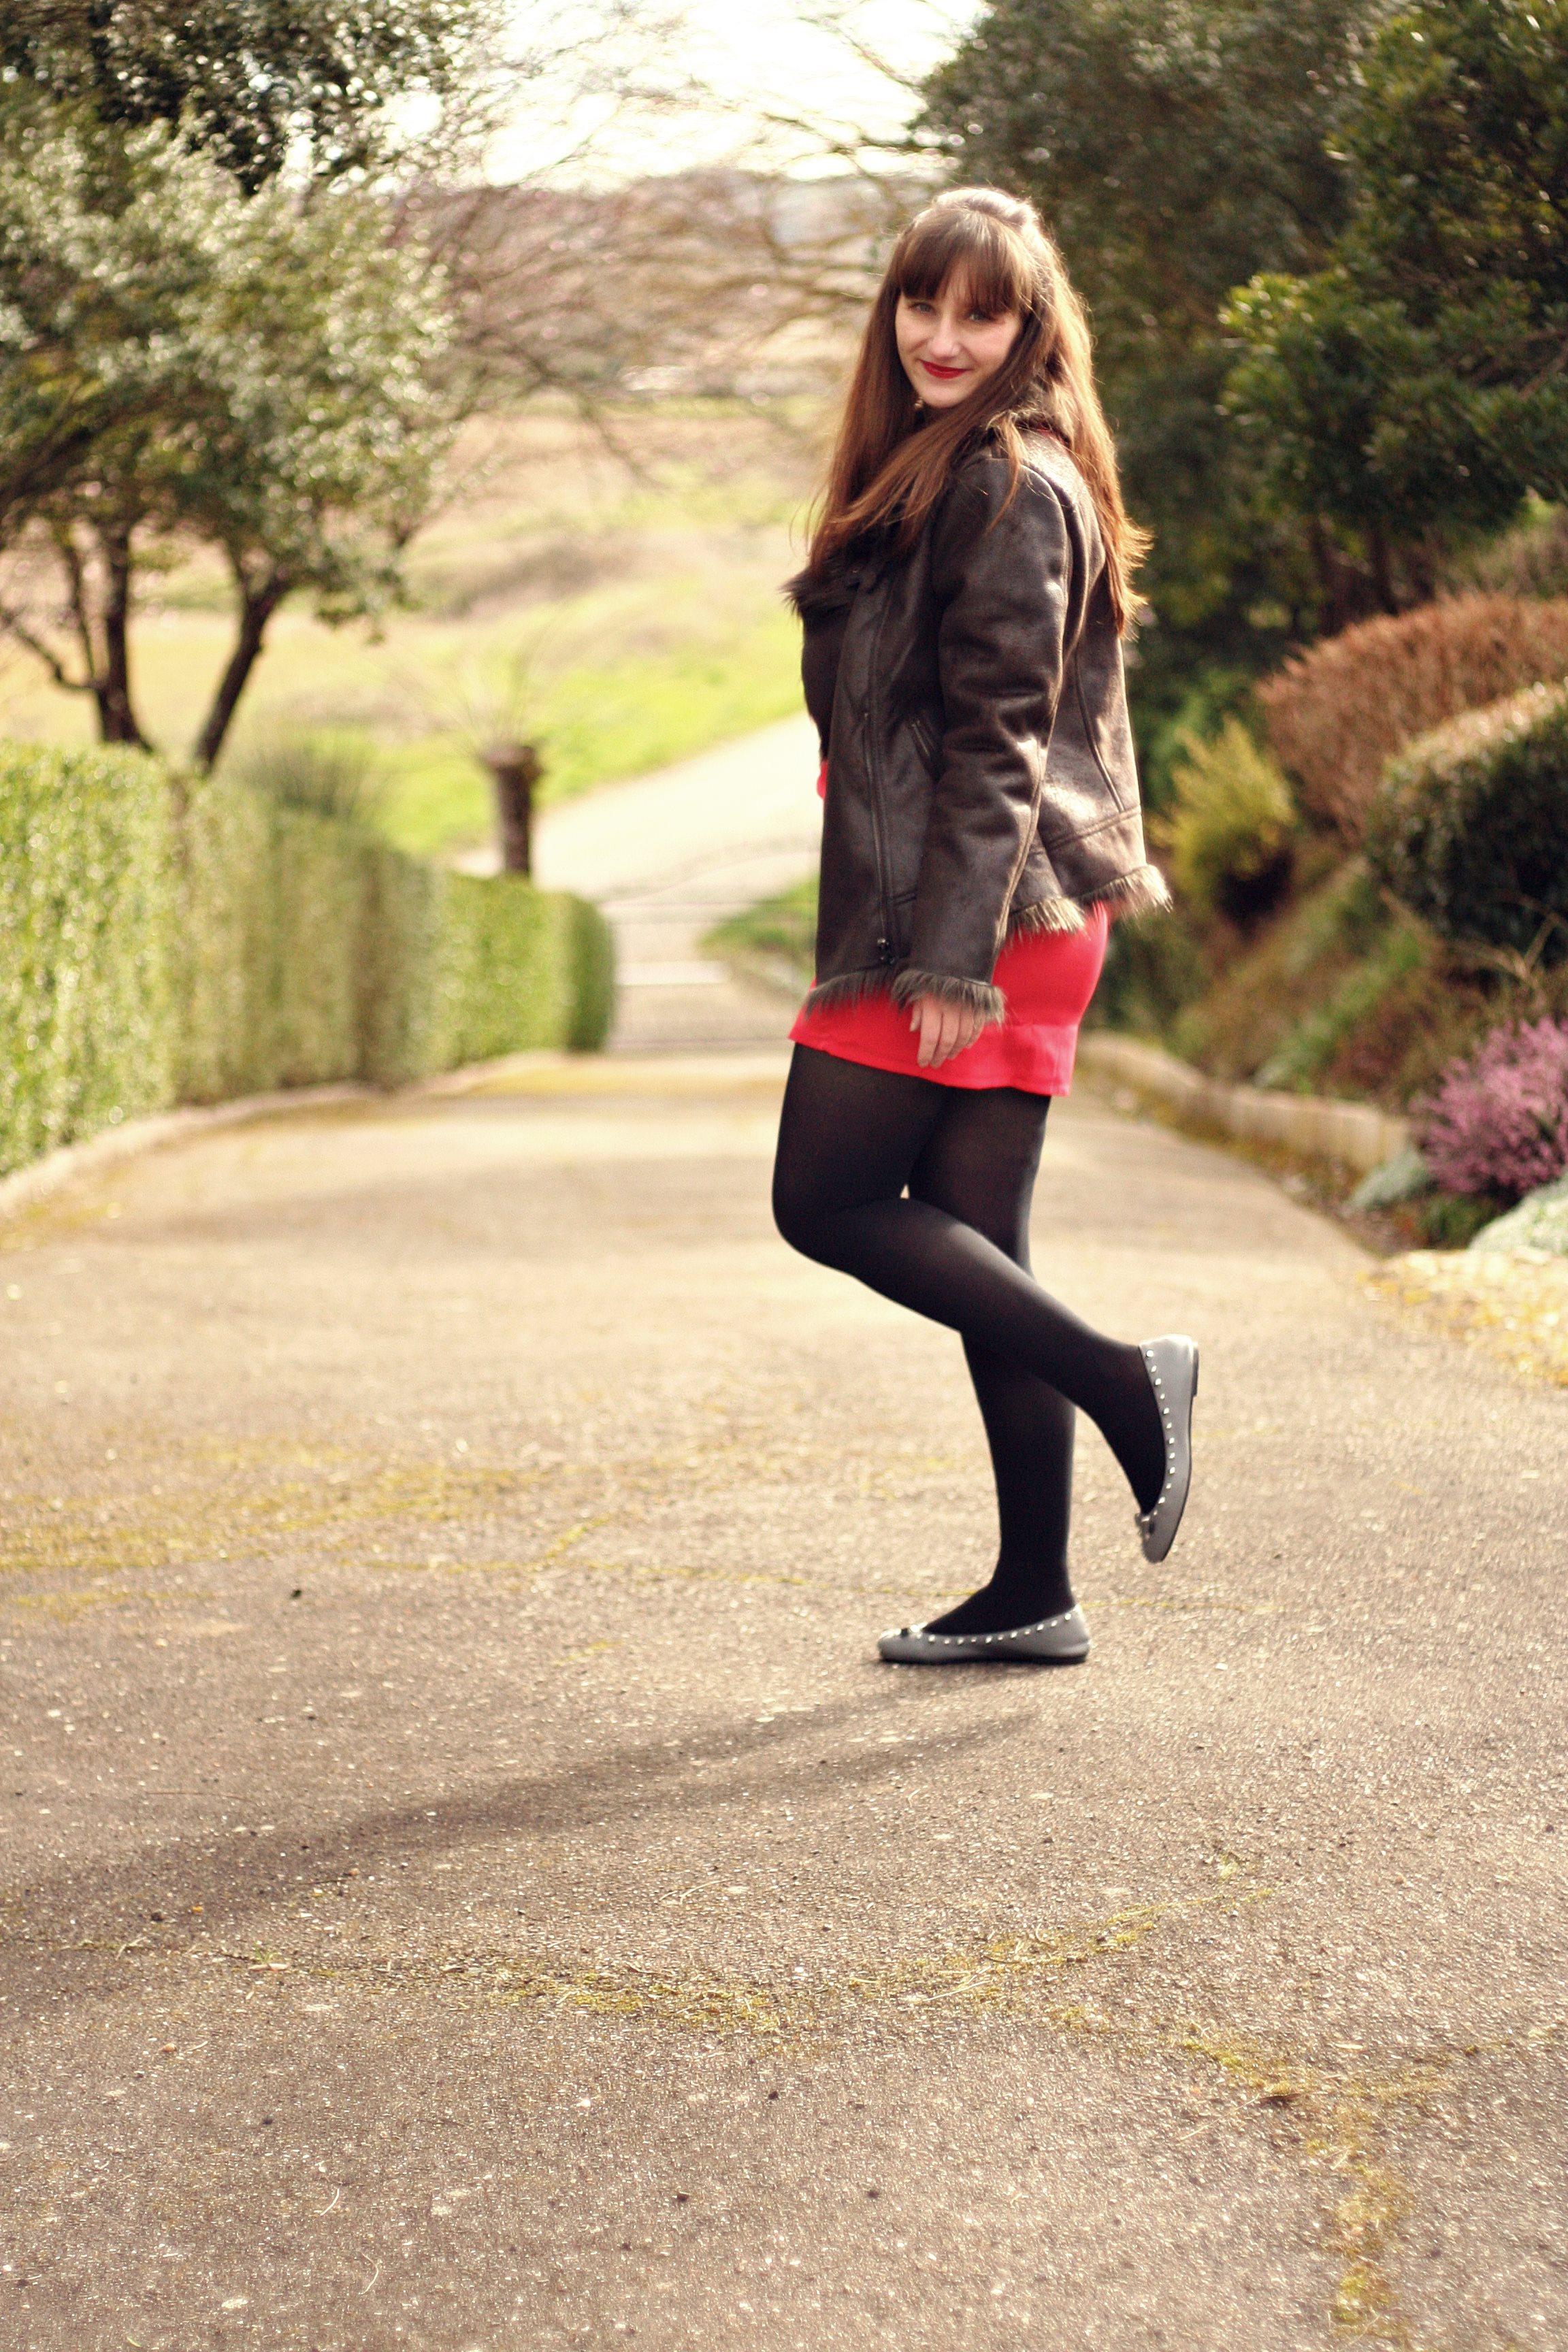 ballerines-marc-jacobs-souris-robe-rouge-blouson-blog-mode